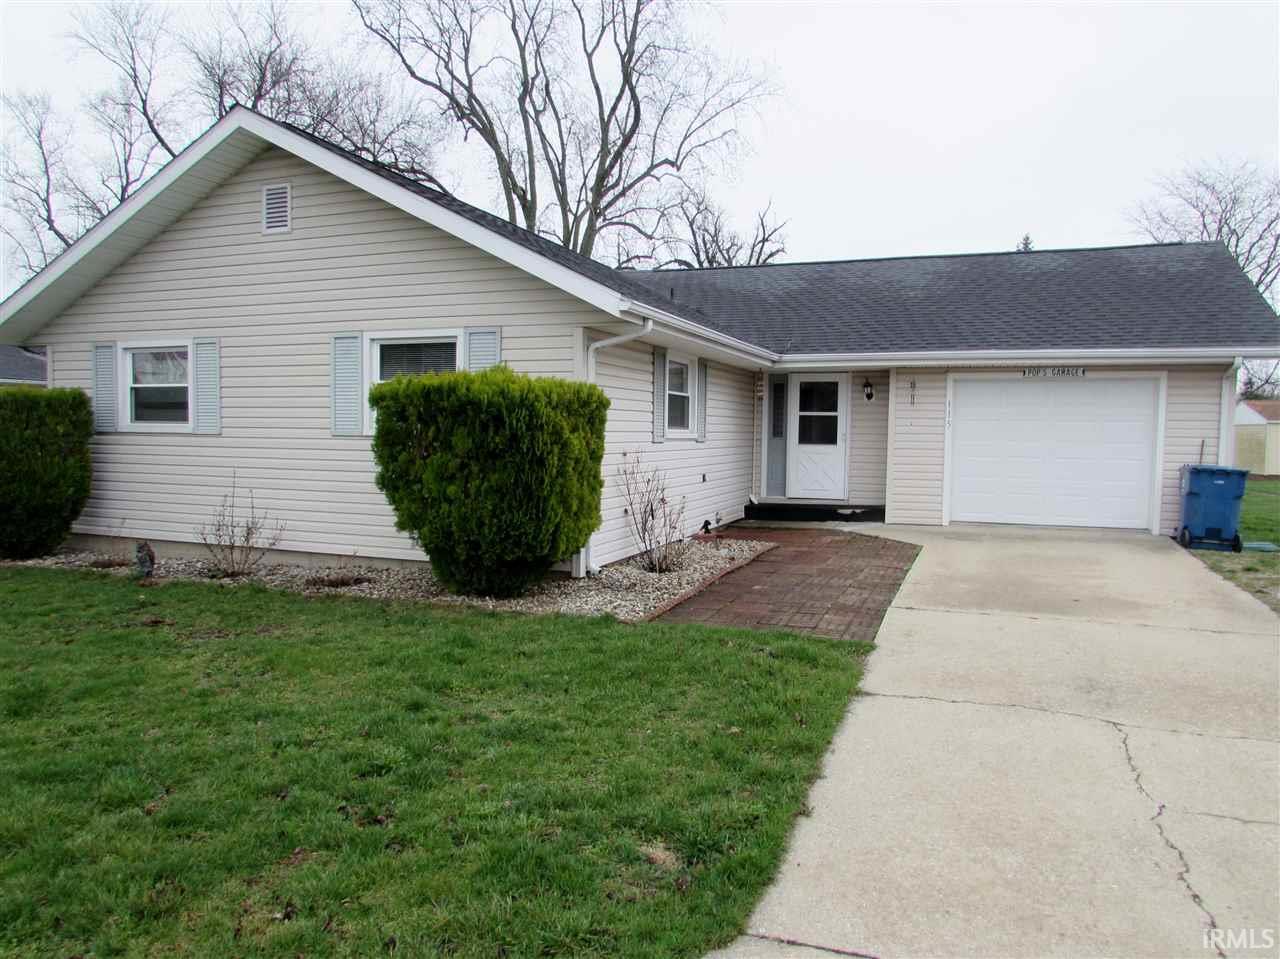 115 N Illinois, Remington, IN 47977